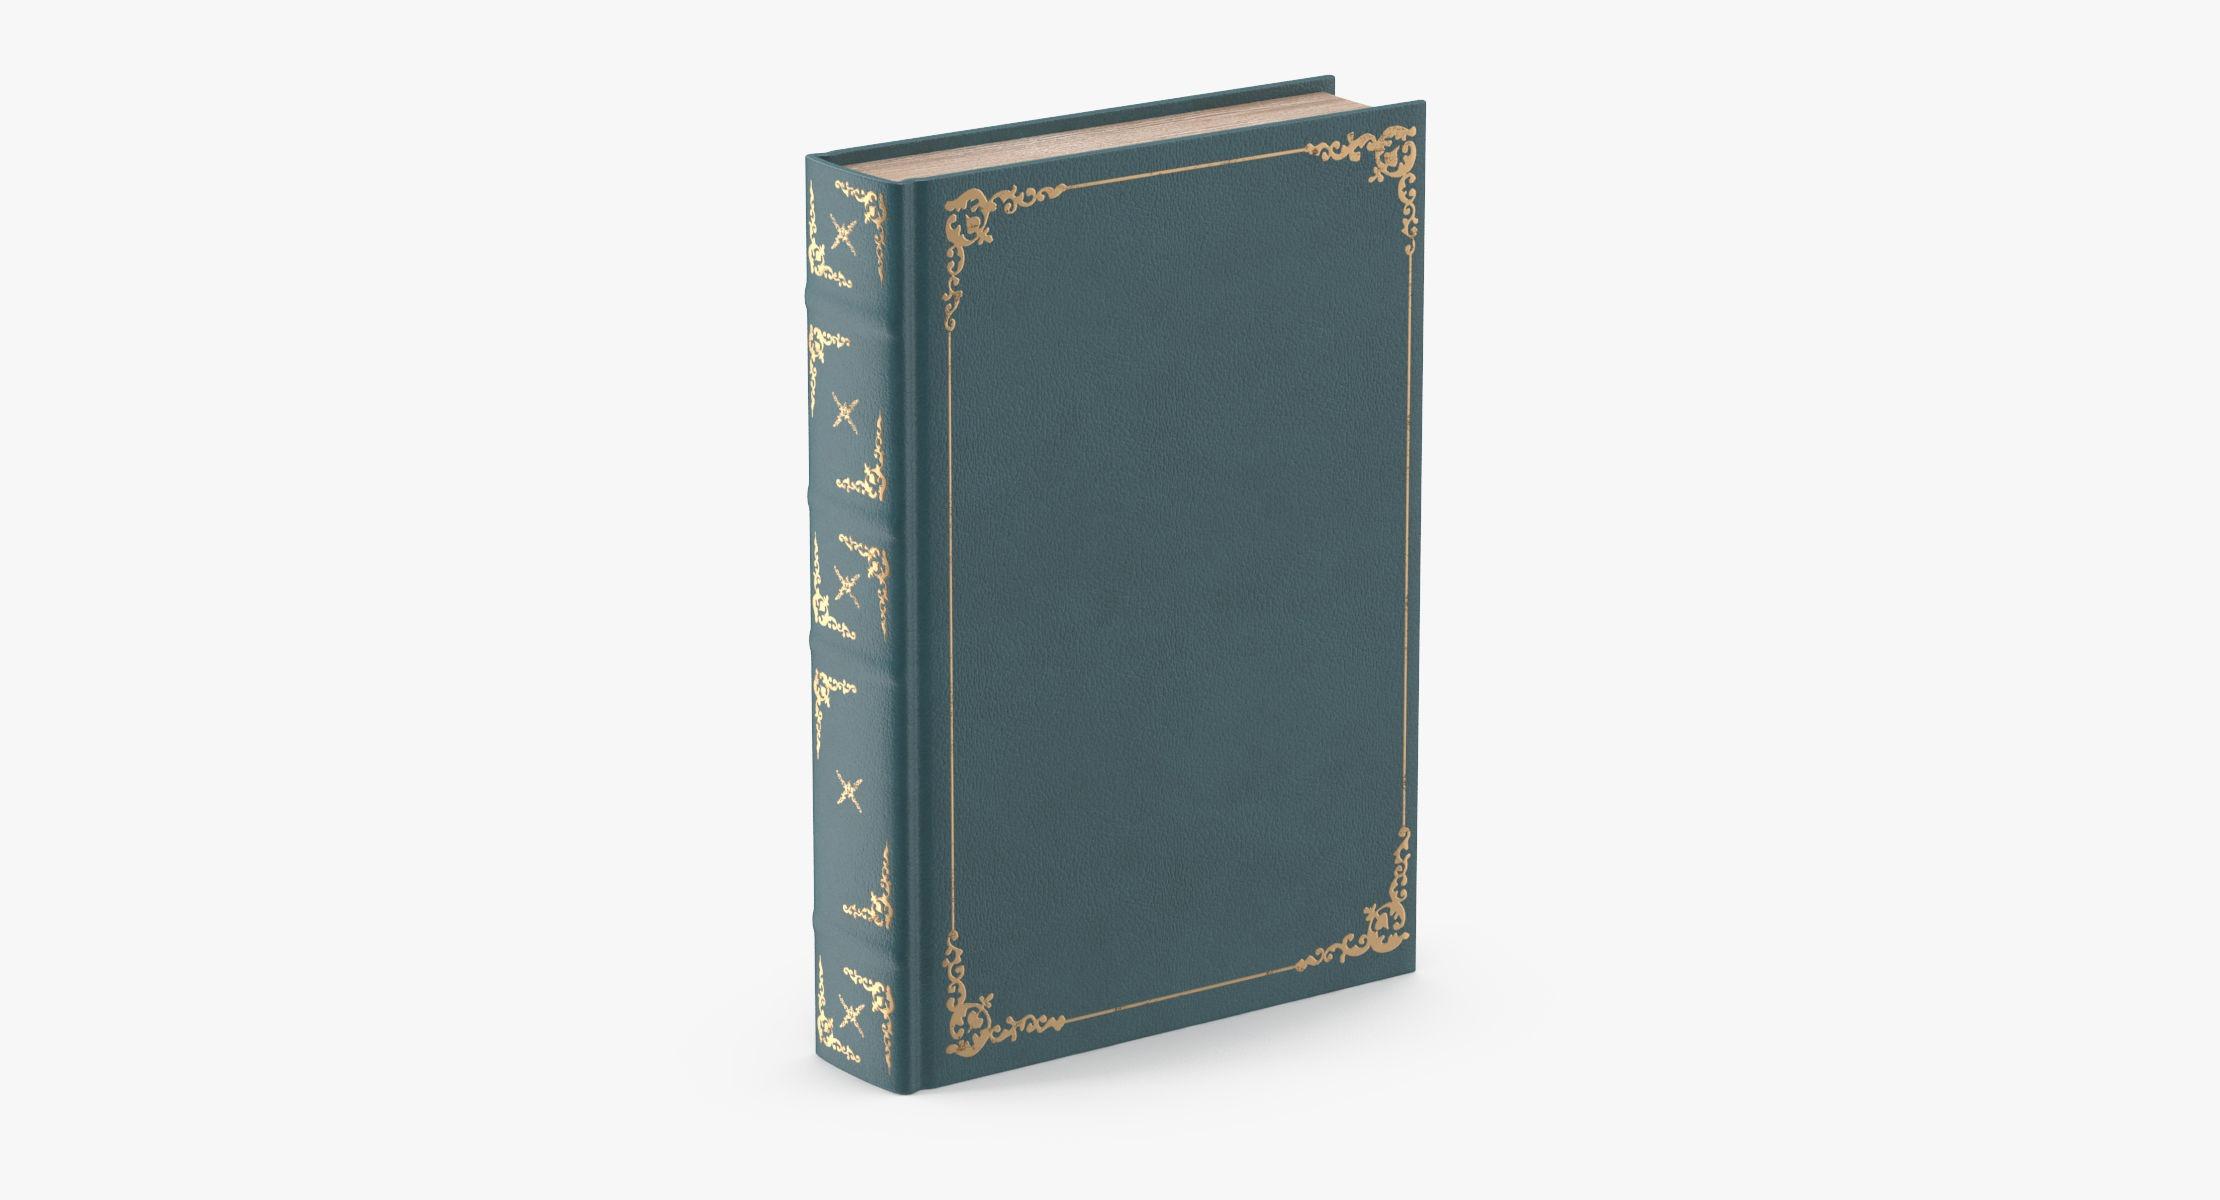 Classic Book 04 Standing - reel 1